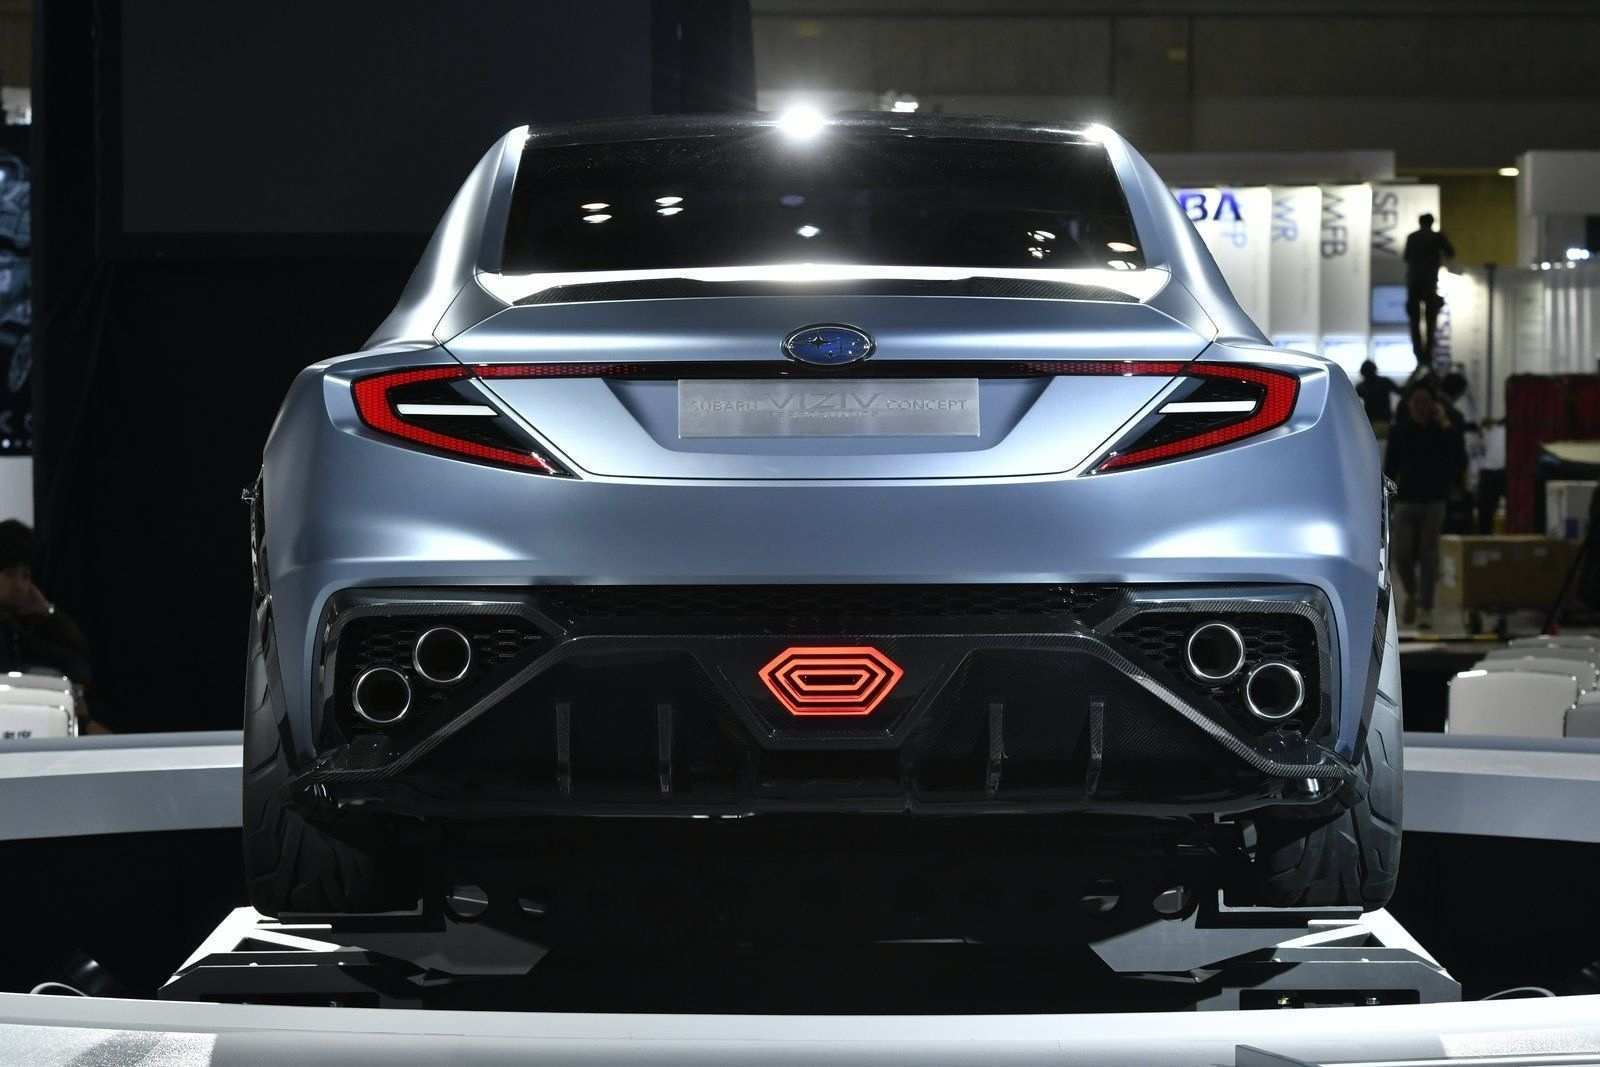 70 New 2020 Subaru Sti News Speed Test by 2020 Subaru Sti News